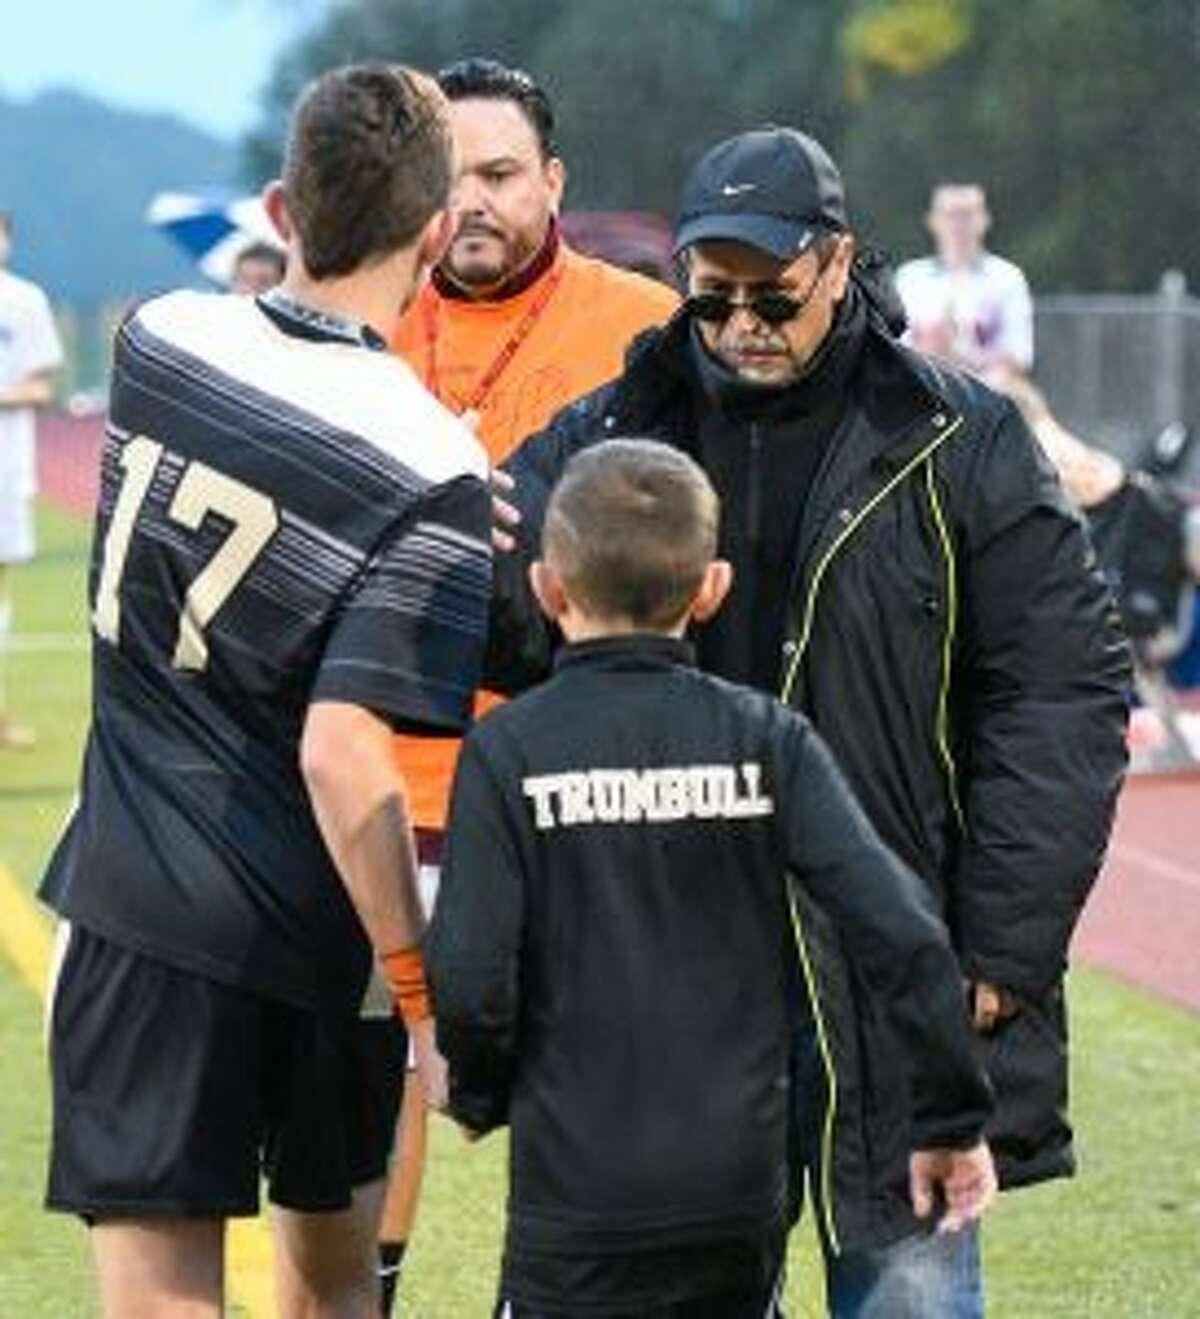 Trumbull coach Sebastian Gangemi shakes hands with the Eagles' Matthew Bagley on Sebe Night. - David G. Whitham photos